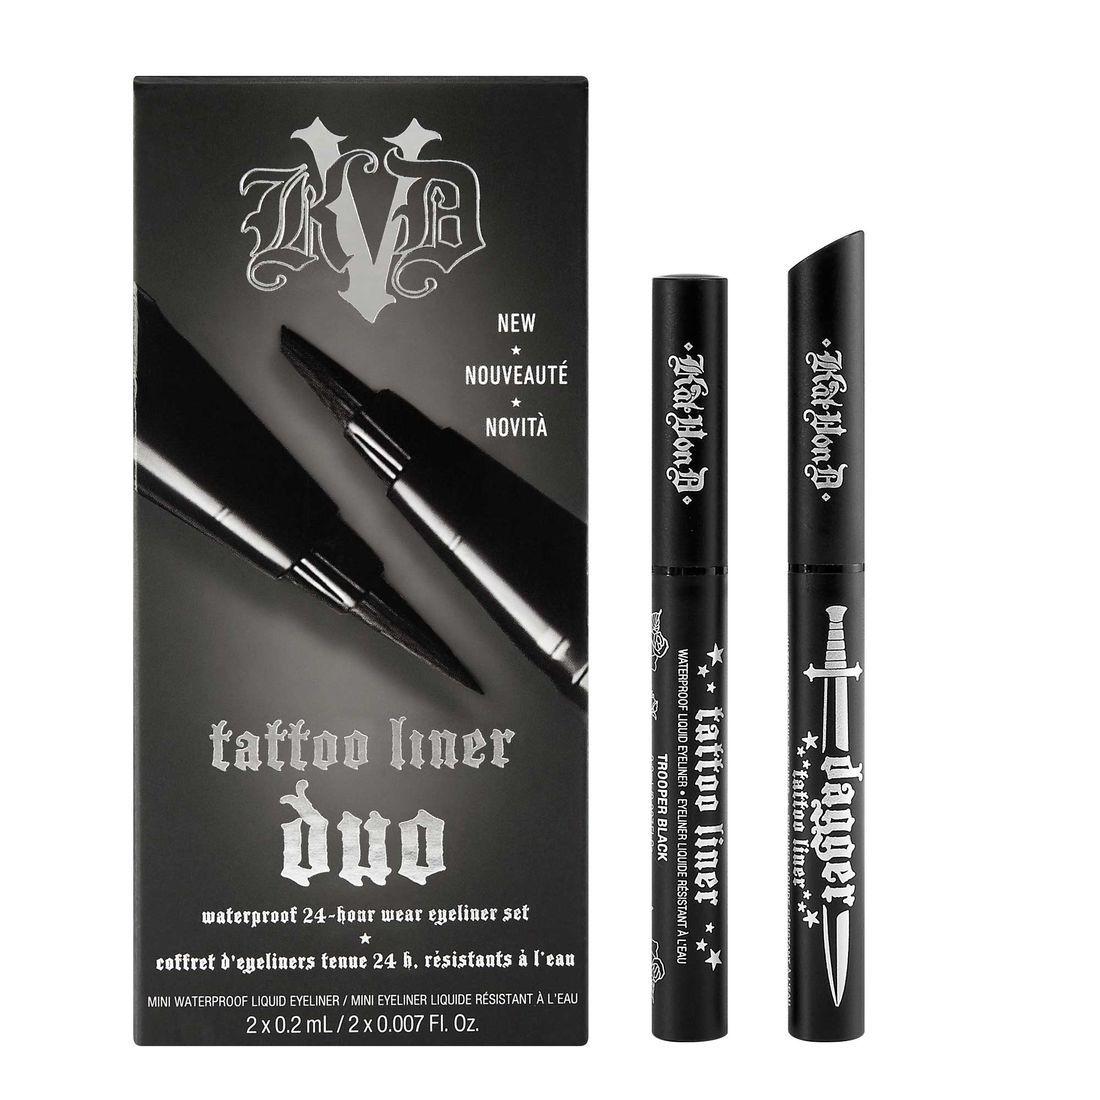 Kitten Mini Tattoo Liner Duo Beauty Tattoos Vegan Eyeliner Vegan Beauty